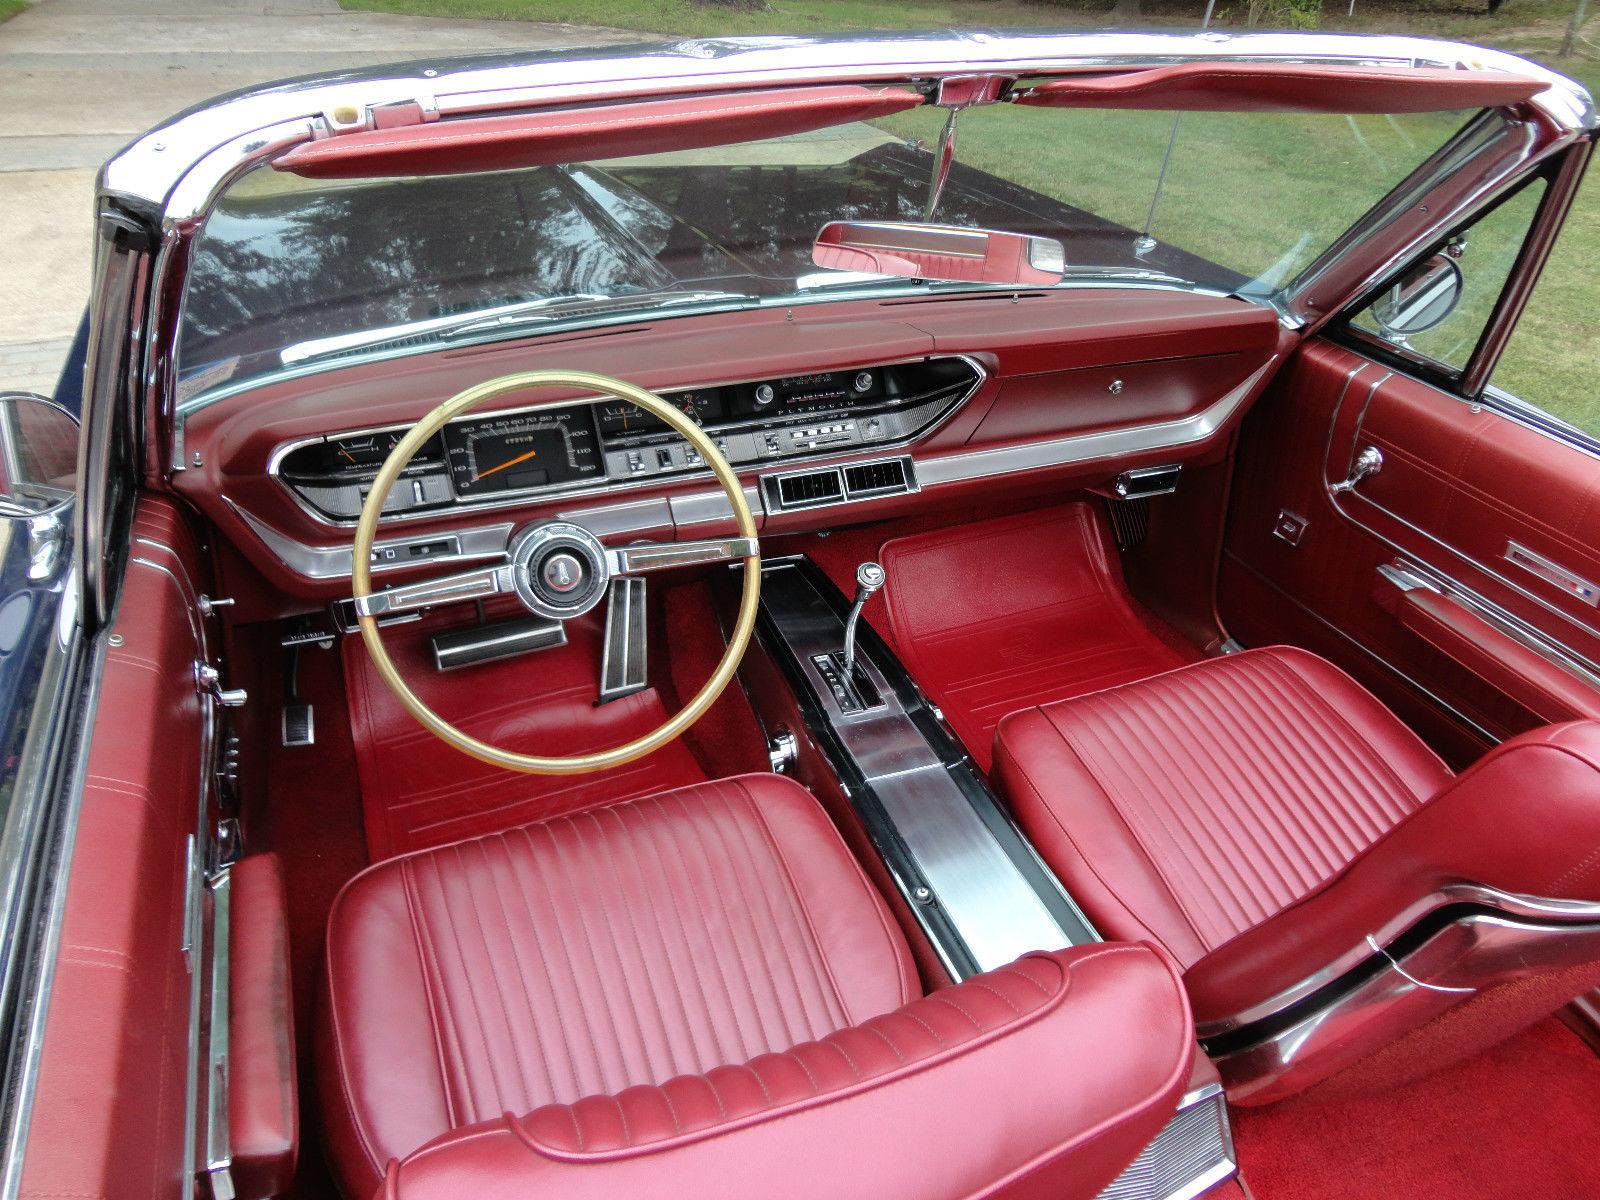 1967 Plymouth Sport Fury Iii Convertible 63 000 Original